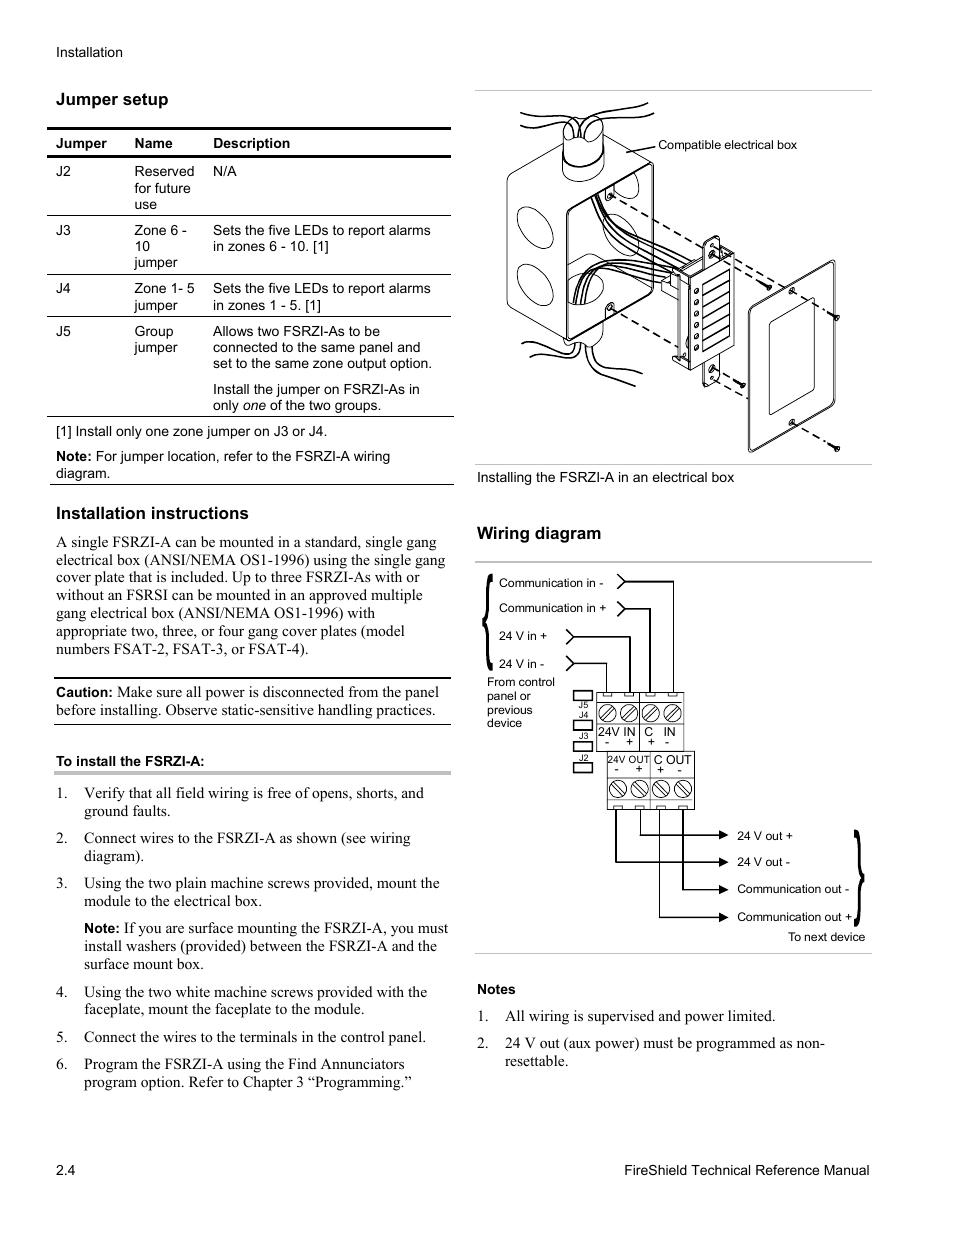 Jumper Setup  Installation Instructions  Wiring Diagram